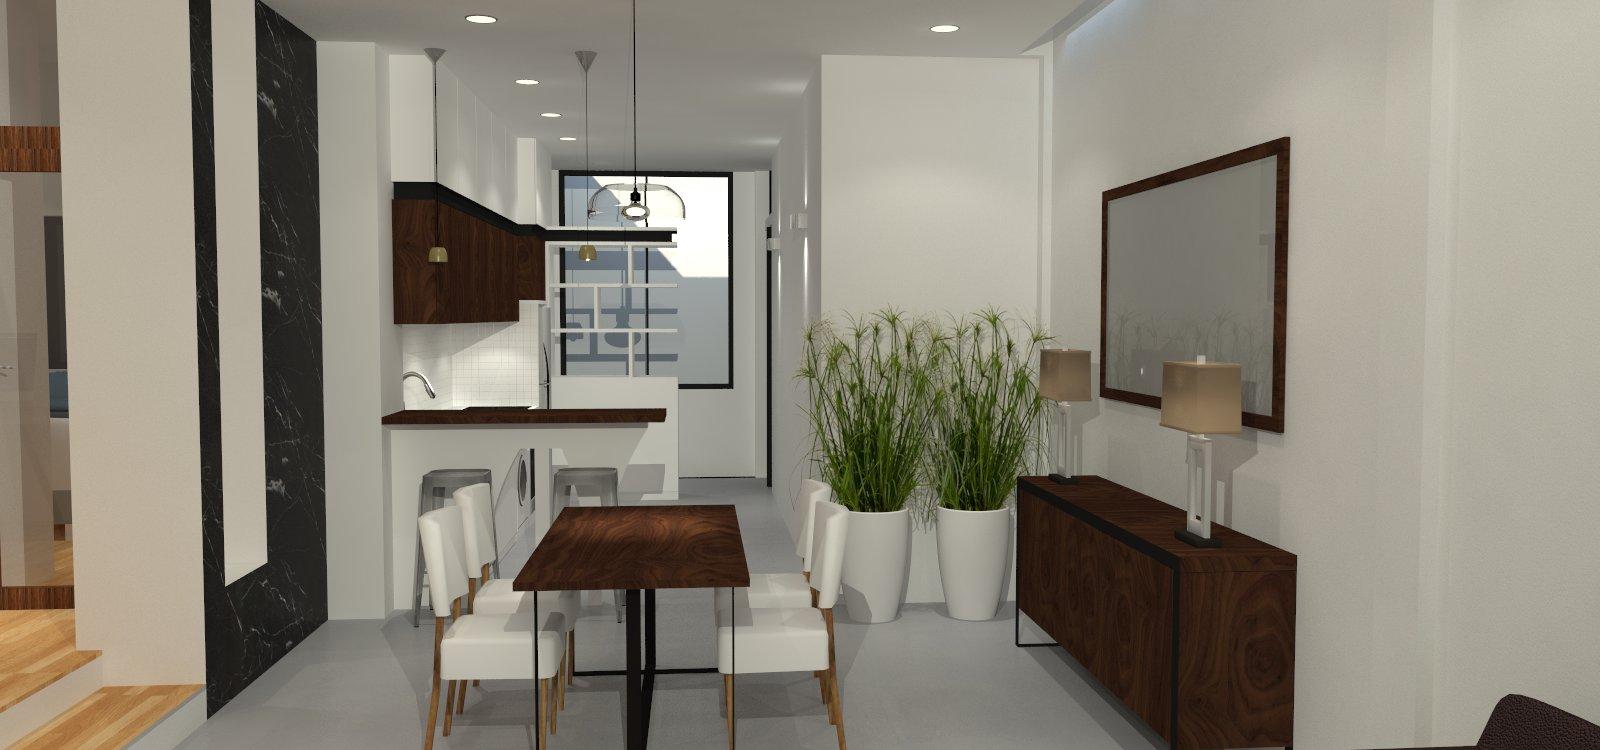 Dining area B.jpg